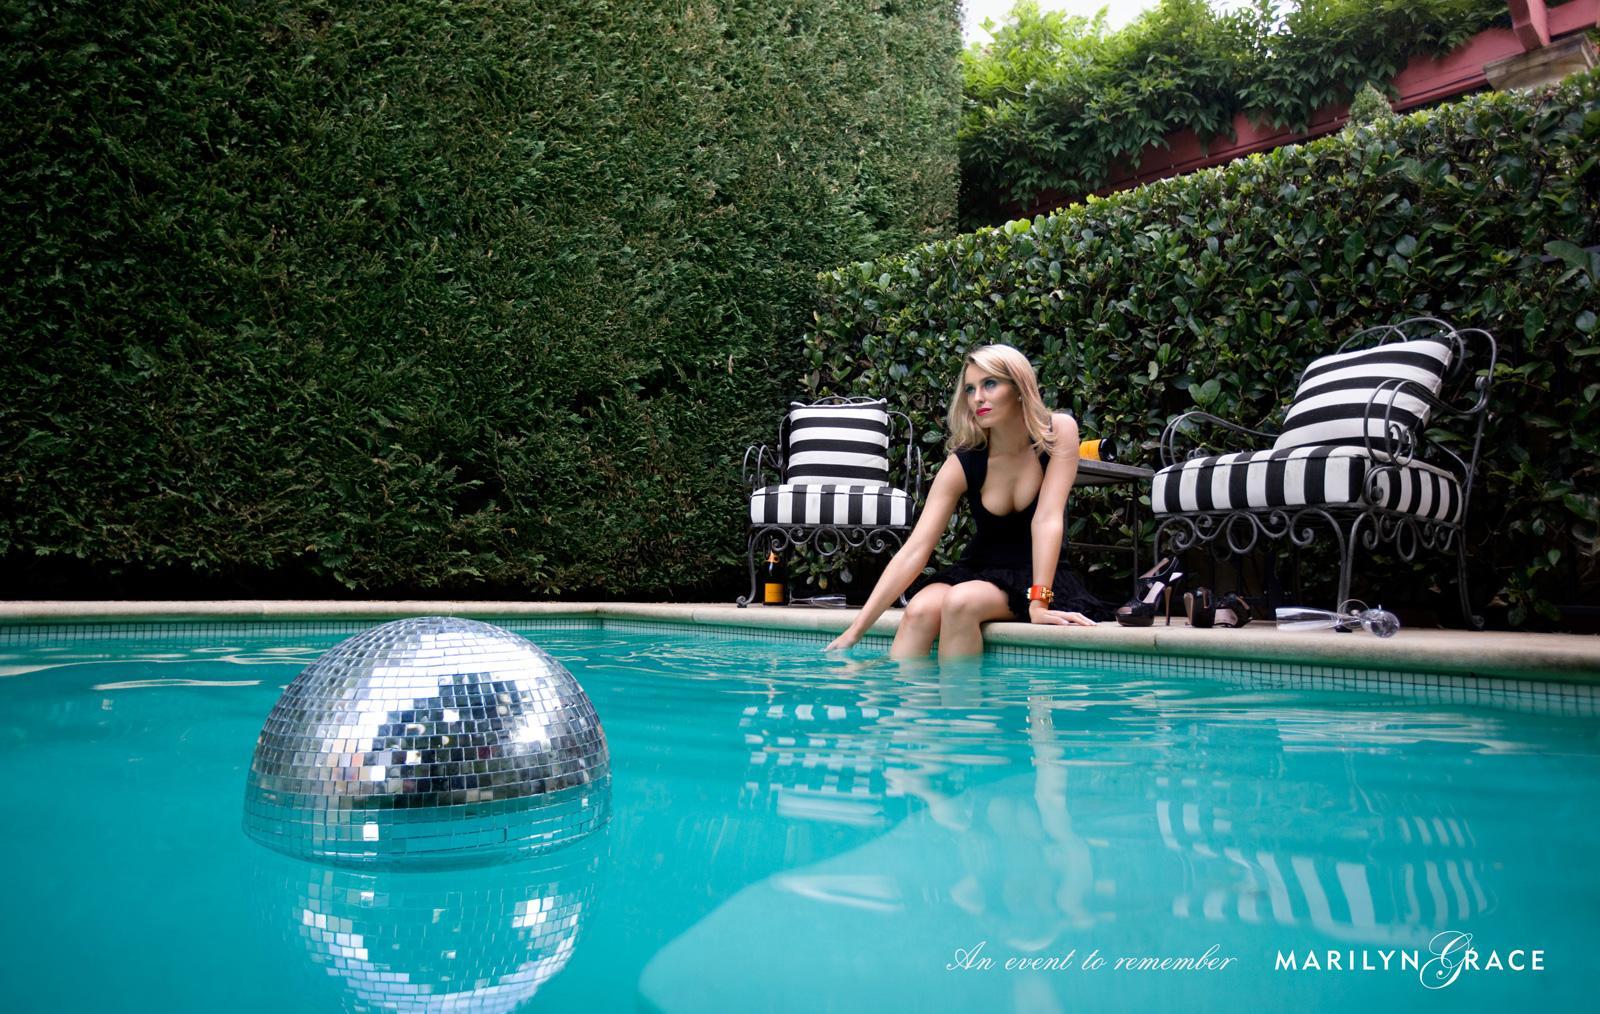 Marilyn Grace Print Ad -  Pool